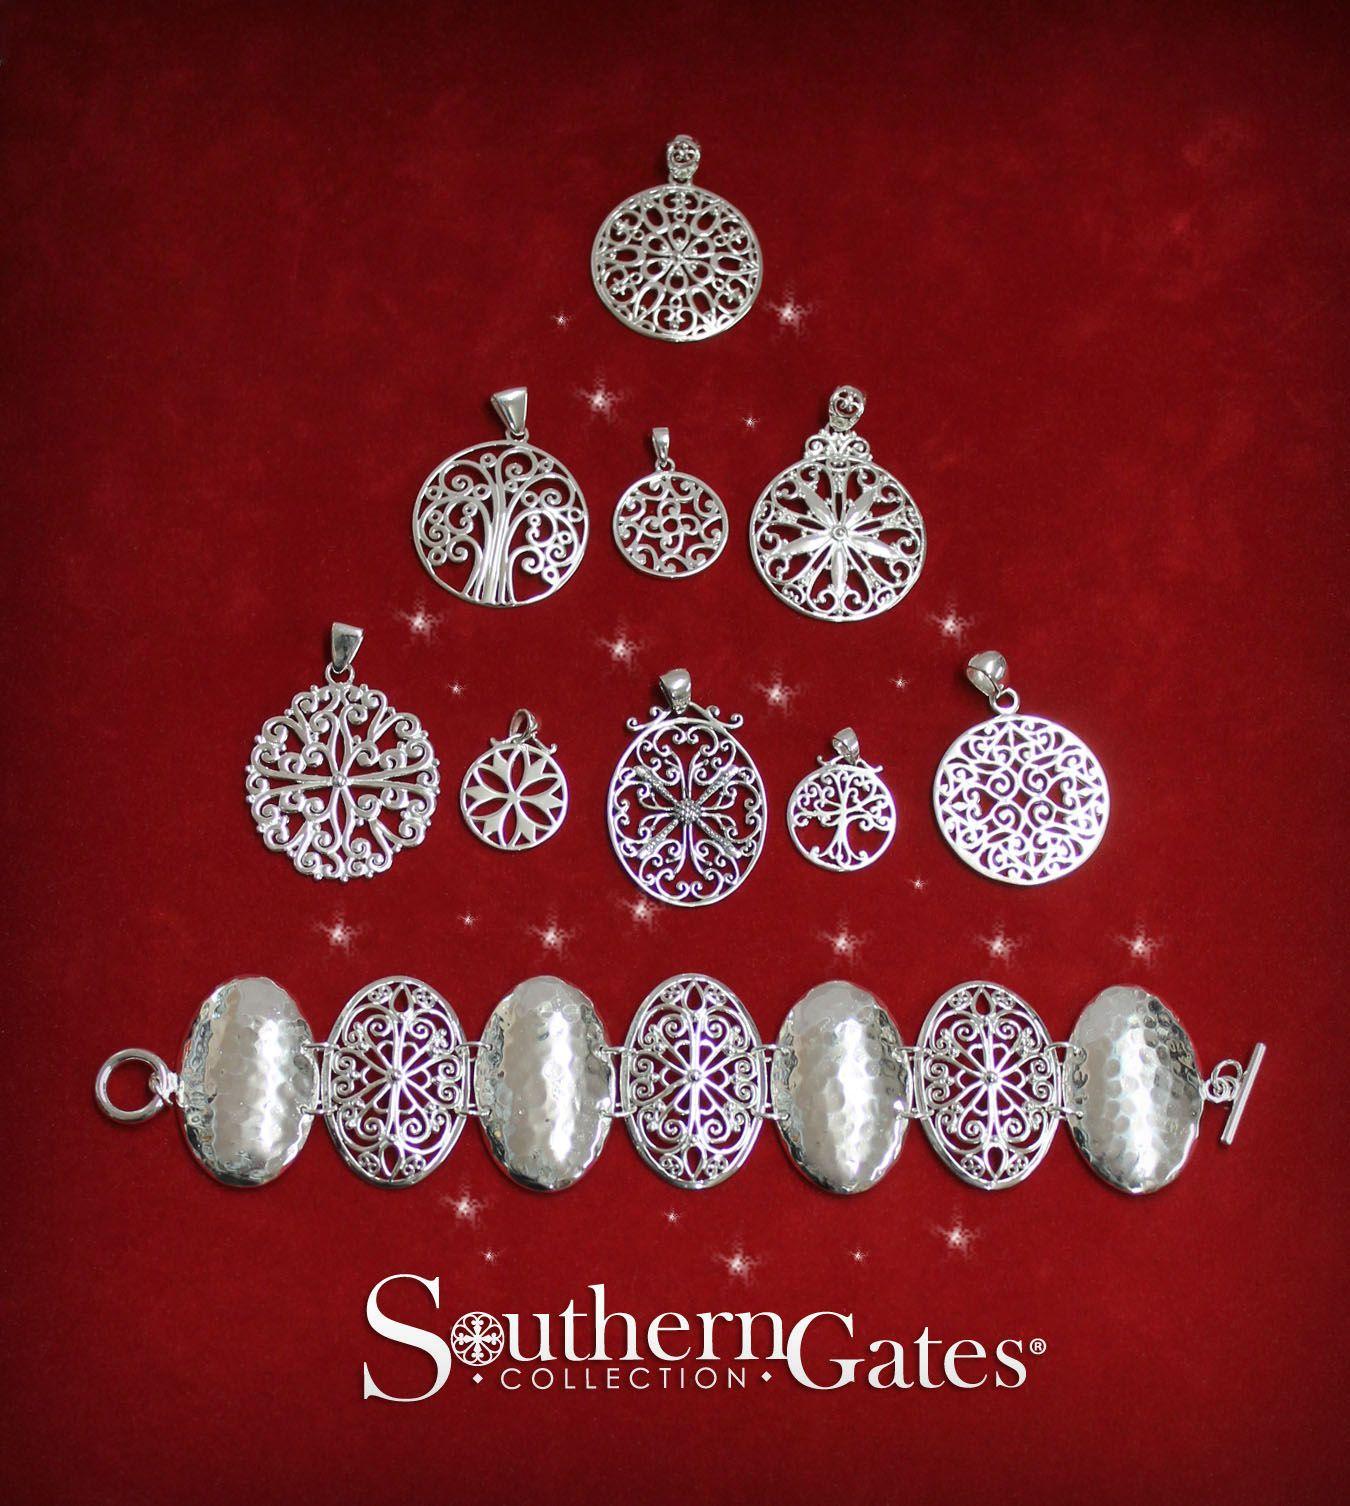 Make It A Southern Gates 174 Christmas Happy Holidays